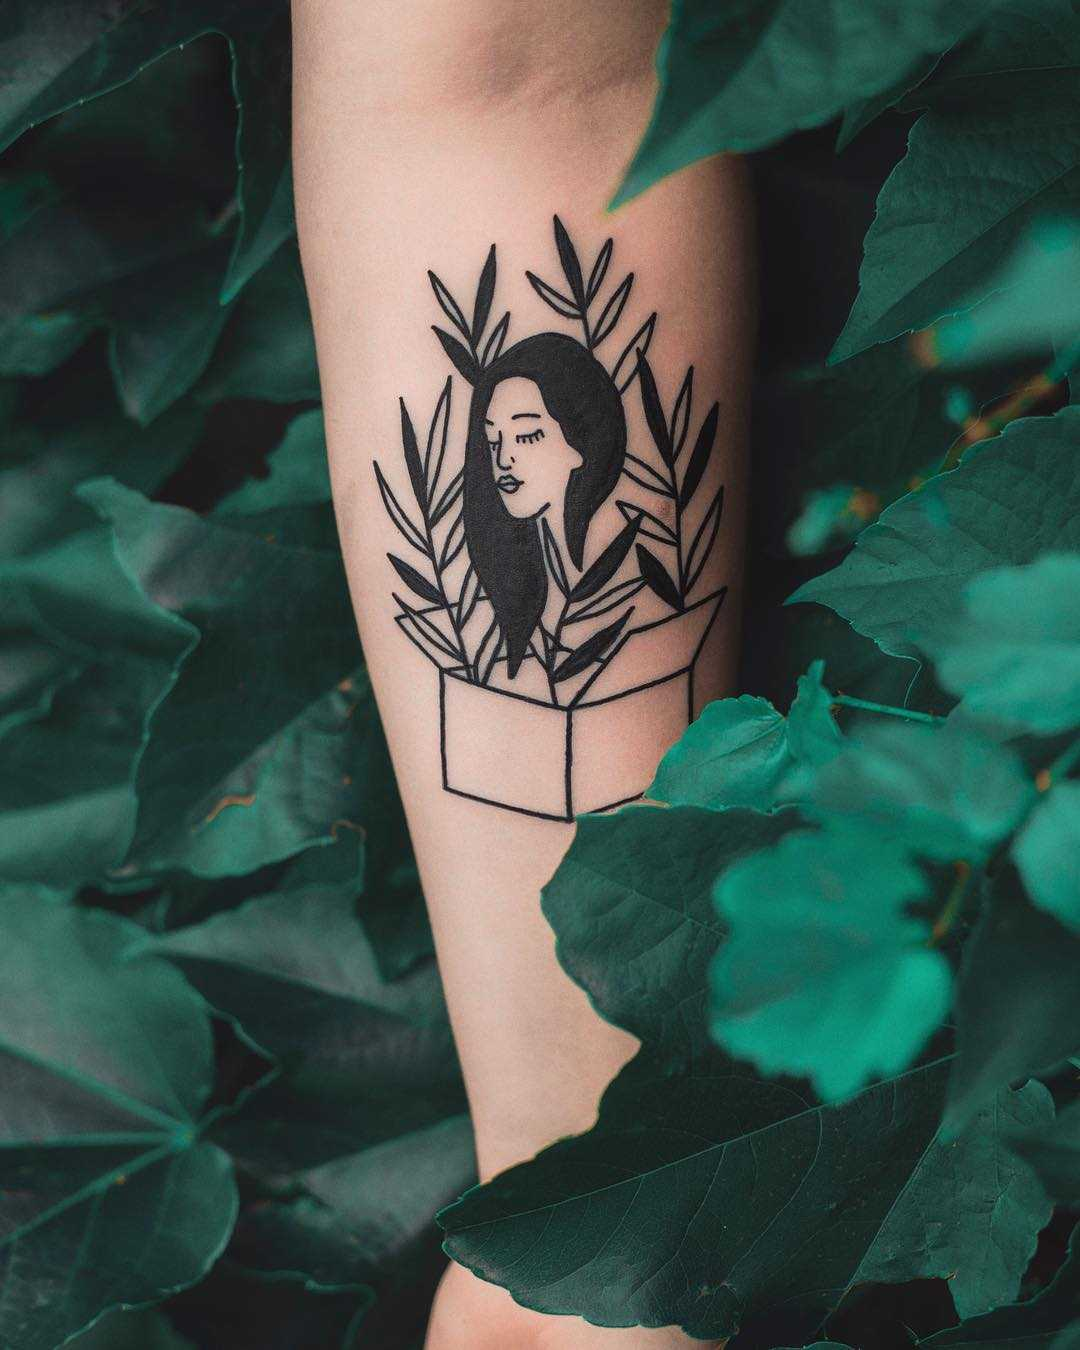 Lady in a box tattoo by Dżudi Bazgrole